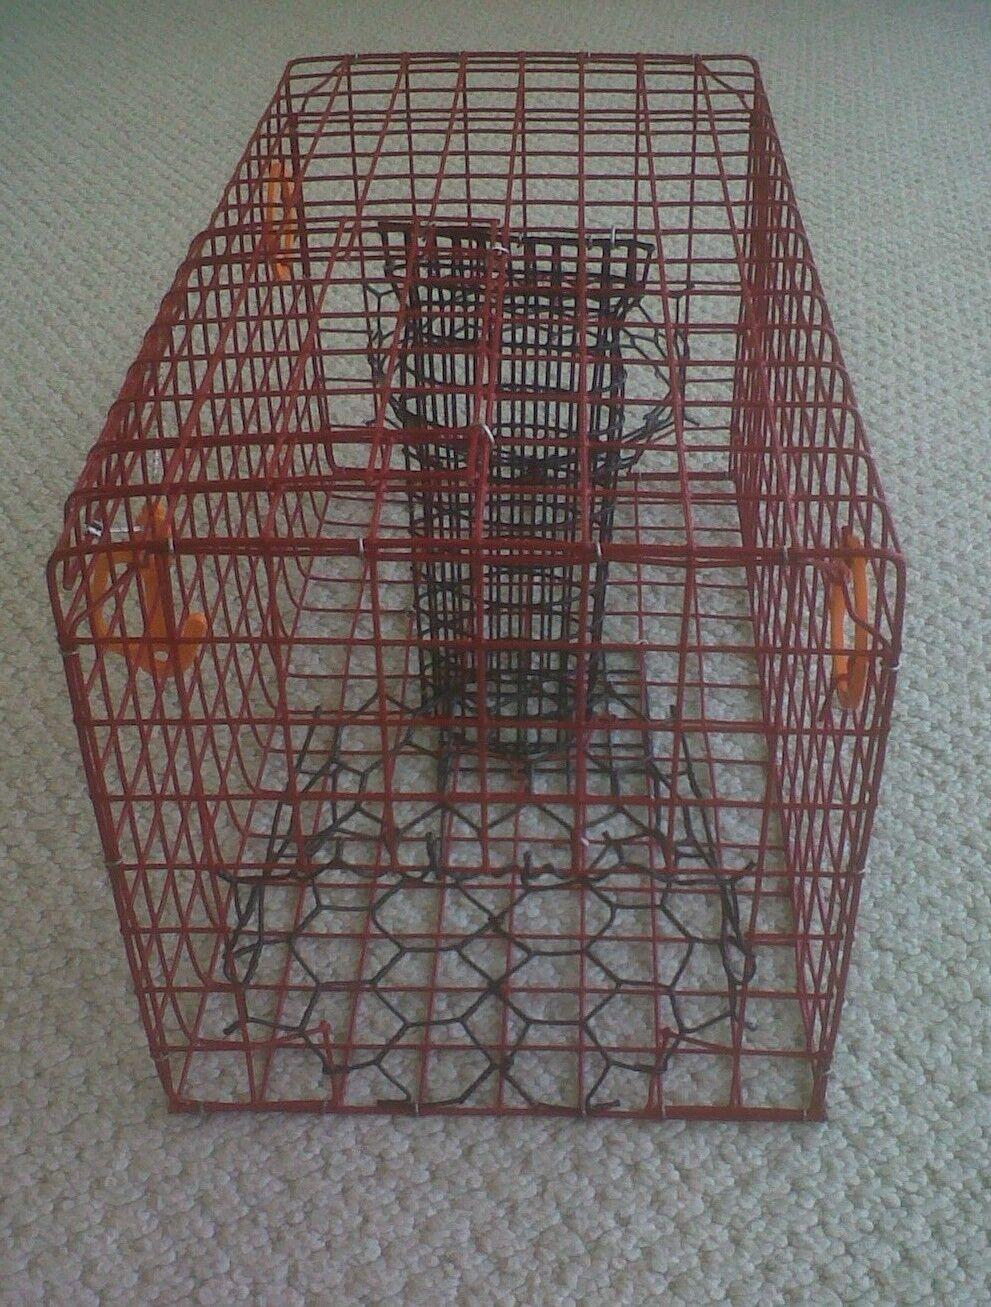 PVC Commercial ROT Commercial PVC Grade Crab Pot / Trap With 50 Foot Line & Grün 5x11 Float 9d1c72